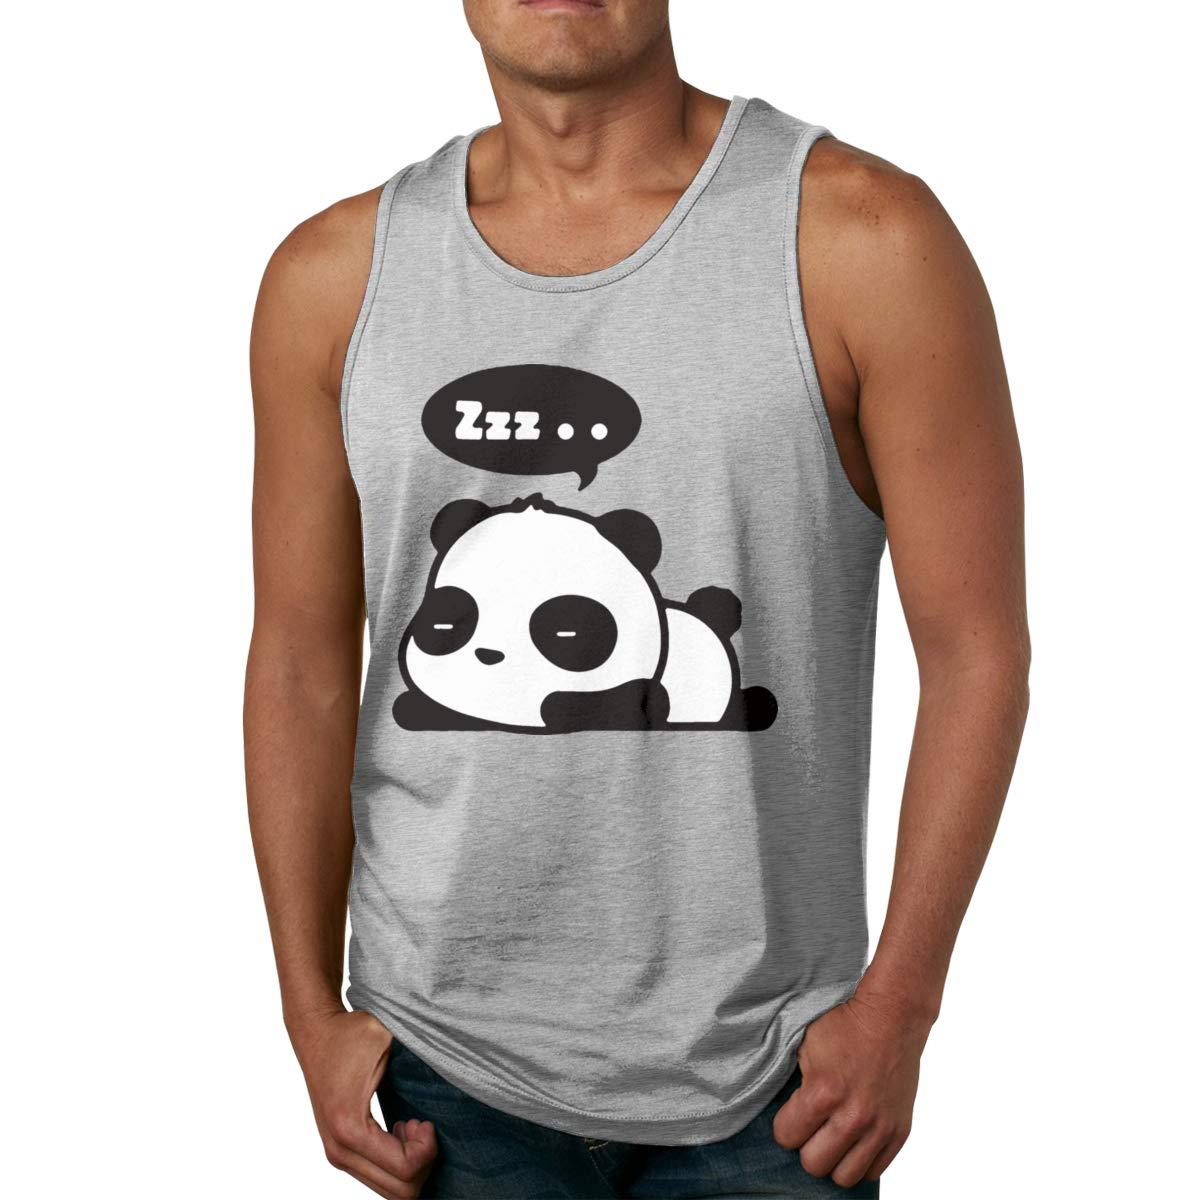 Seuriamin Sleeping Panda Cute Summer Tennis Sleeveless Tank Top T Shirt